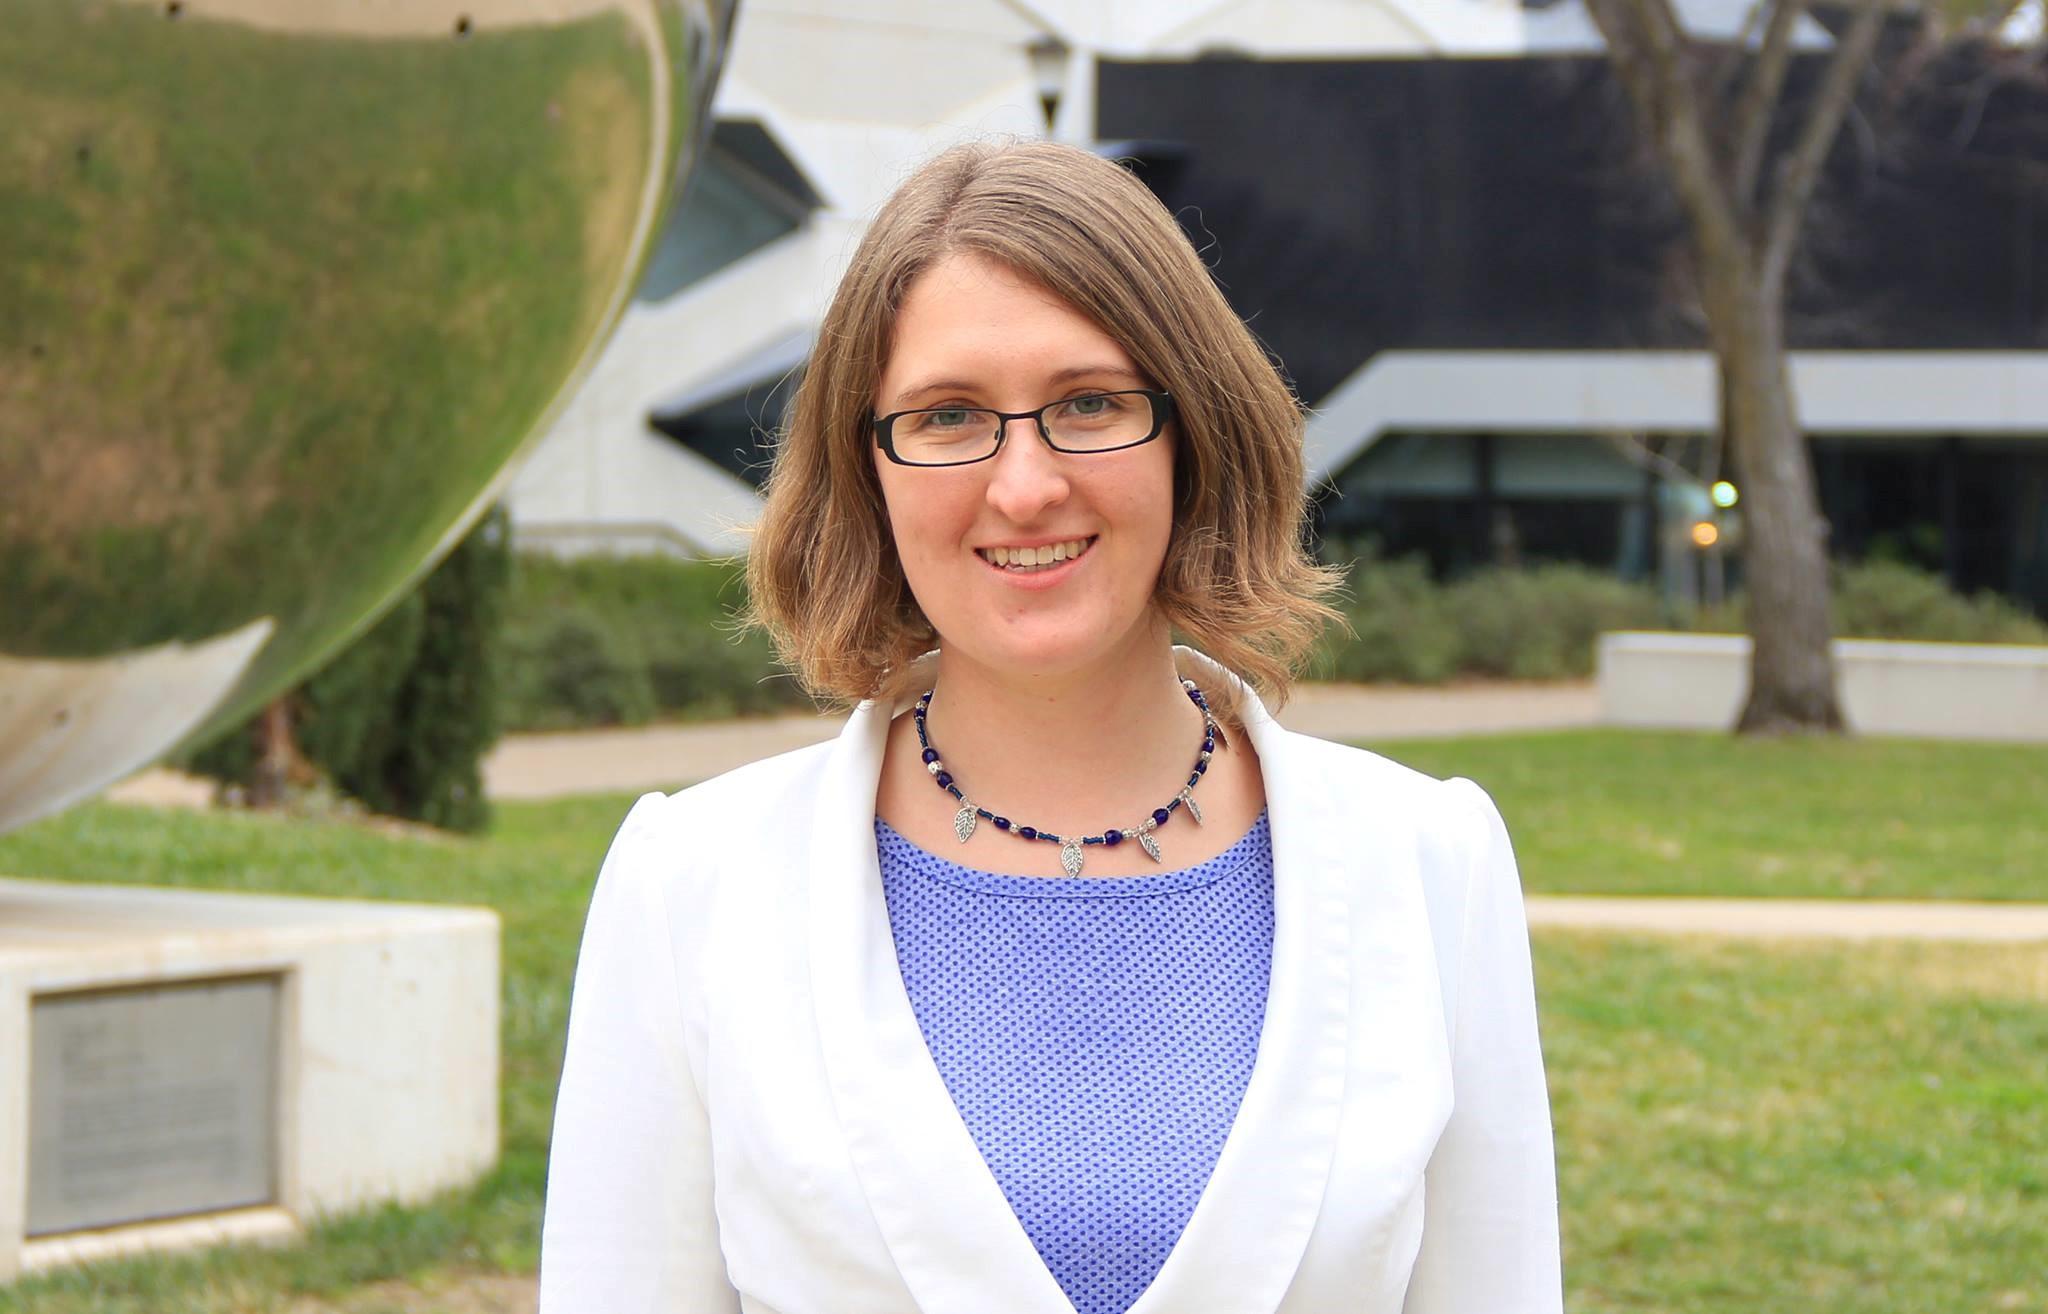 College of Arts and Social Sciences; Lauren Sadow